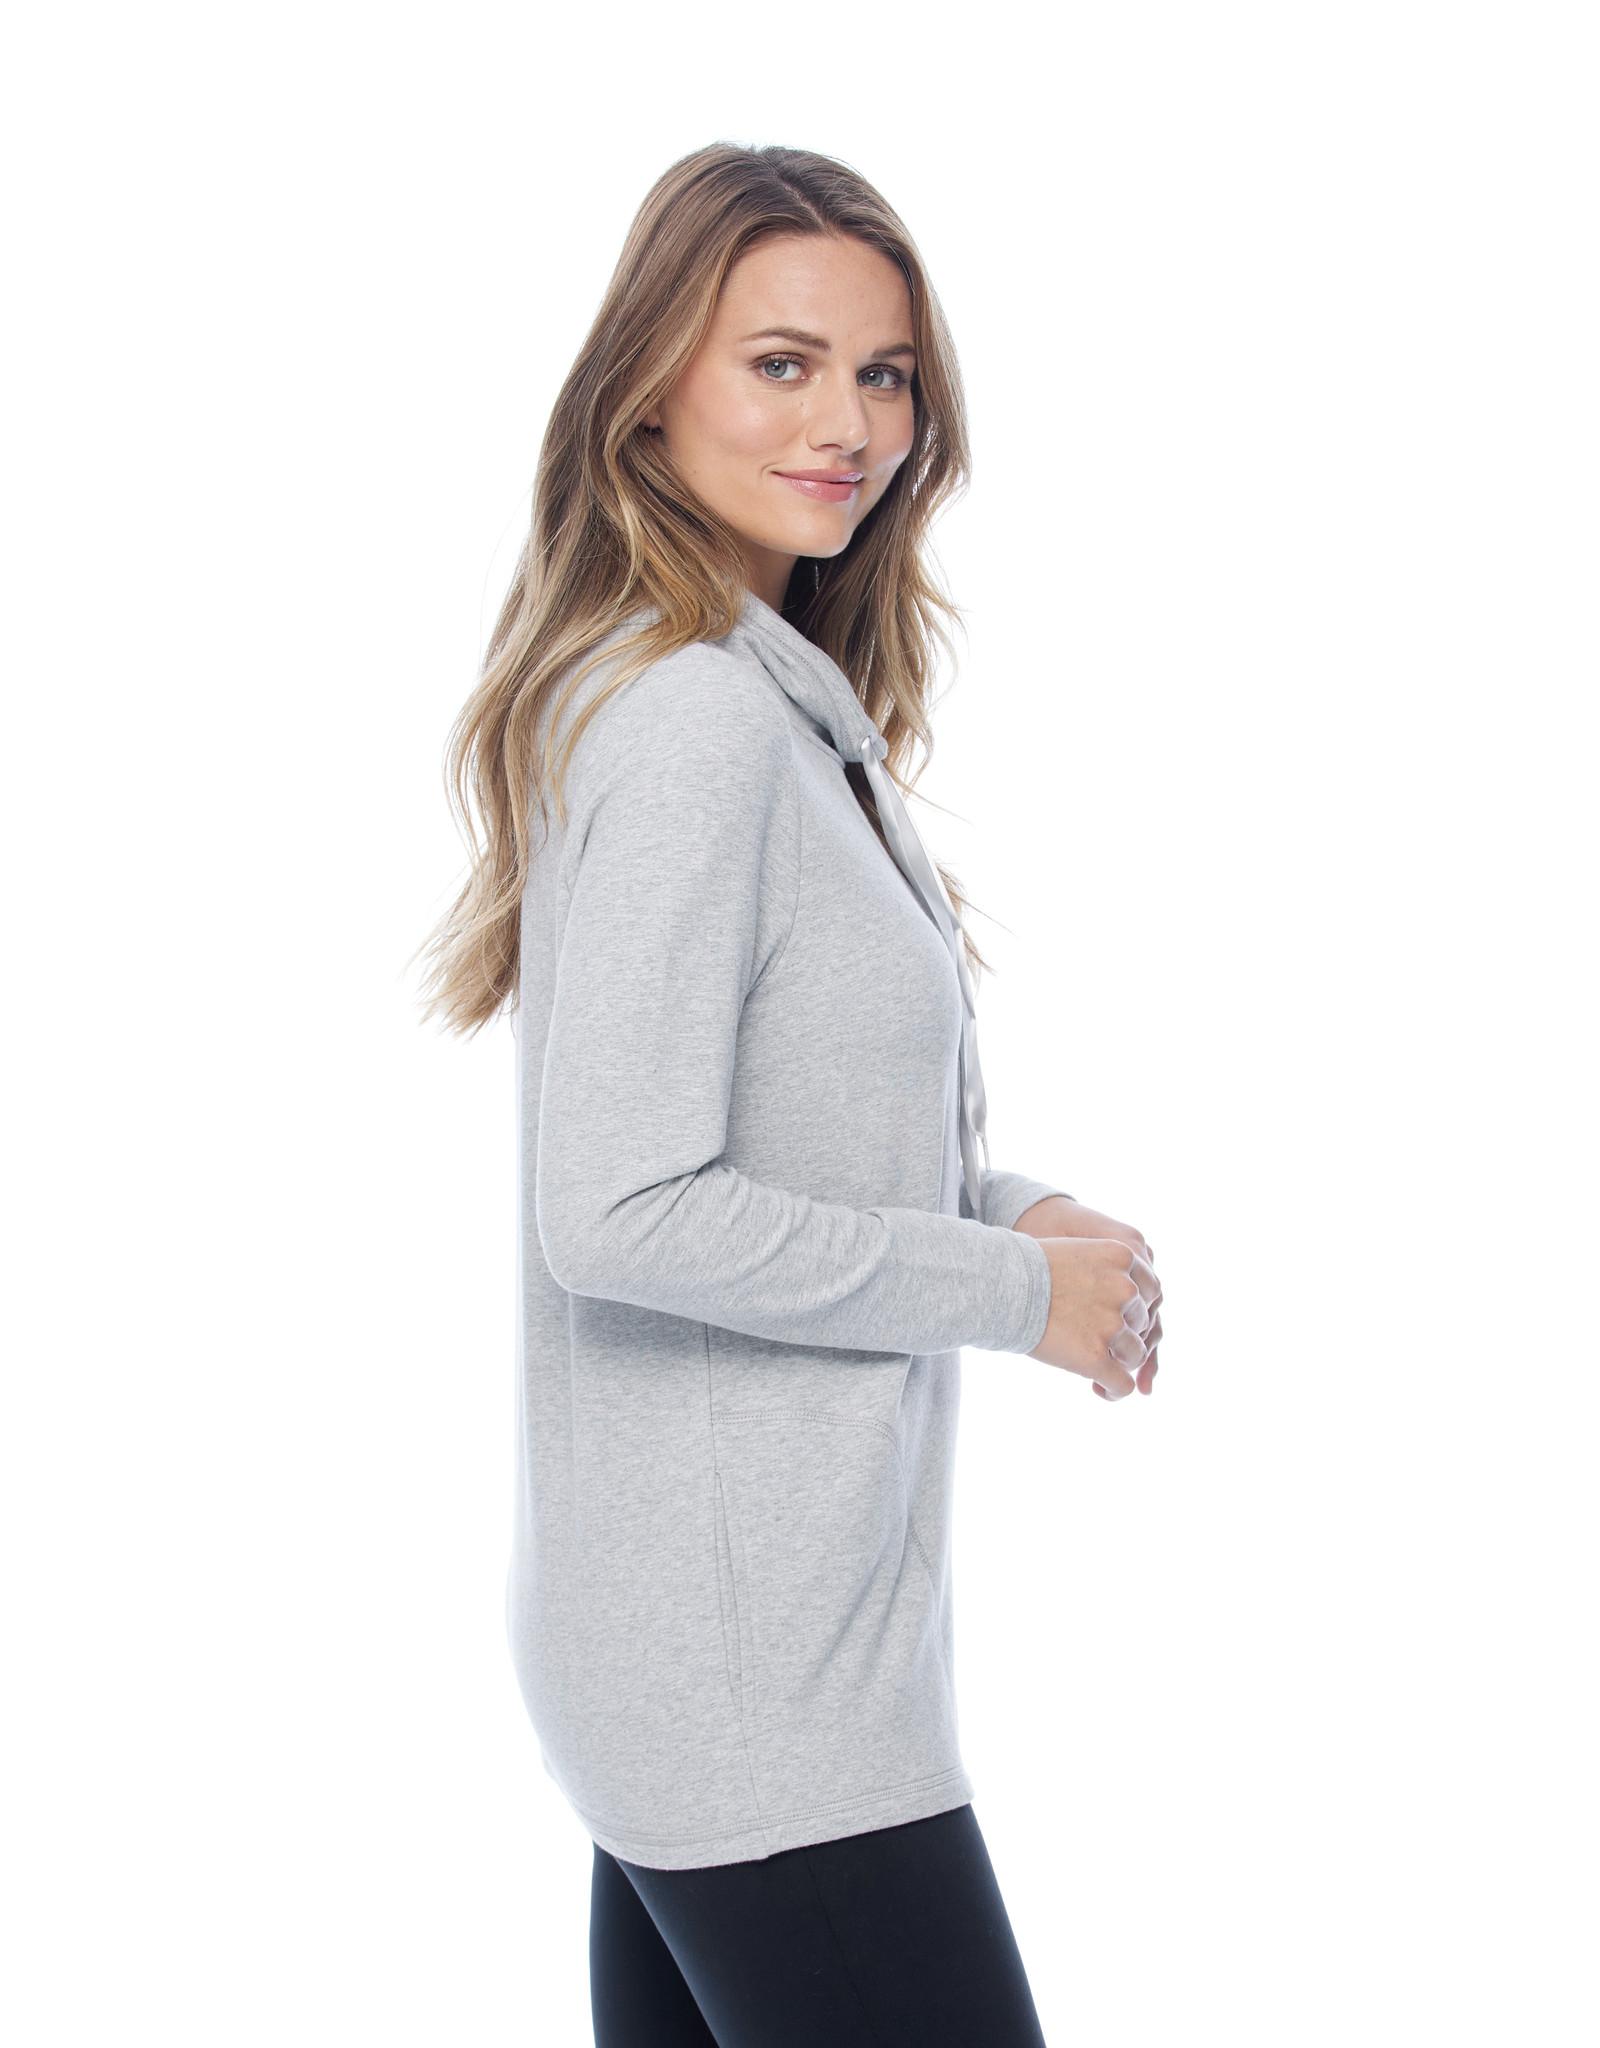 French Dressing Jeans FDJ soft vintage wash funnel neck top 1793155